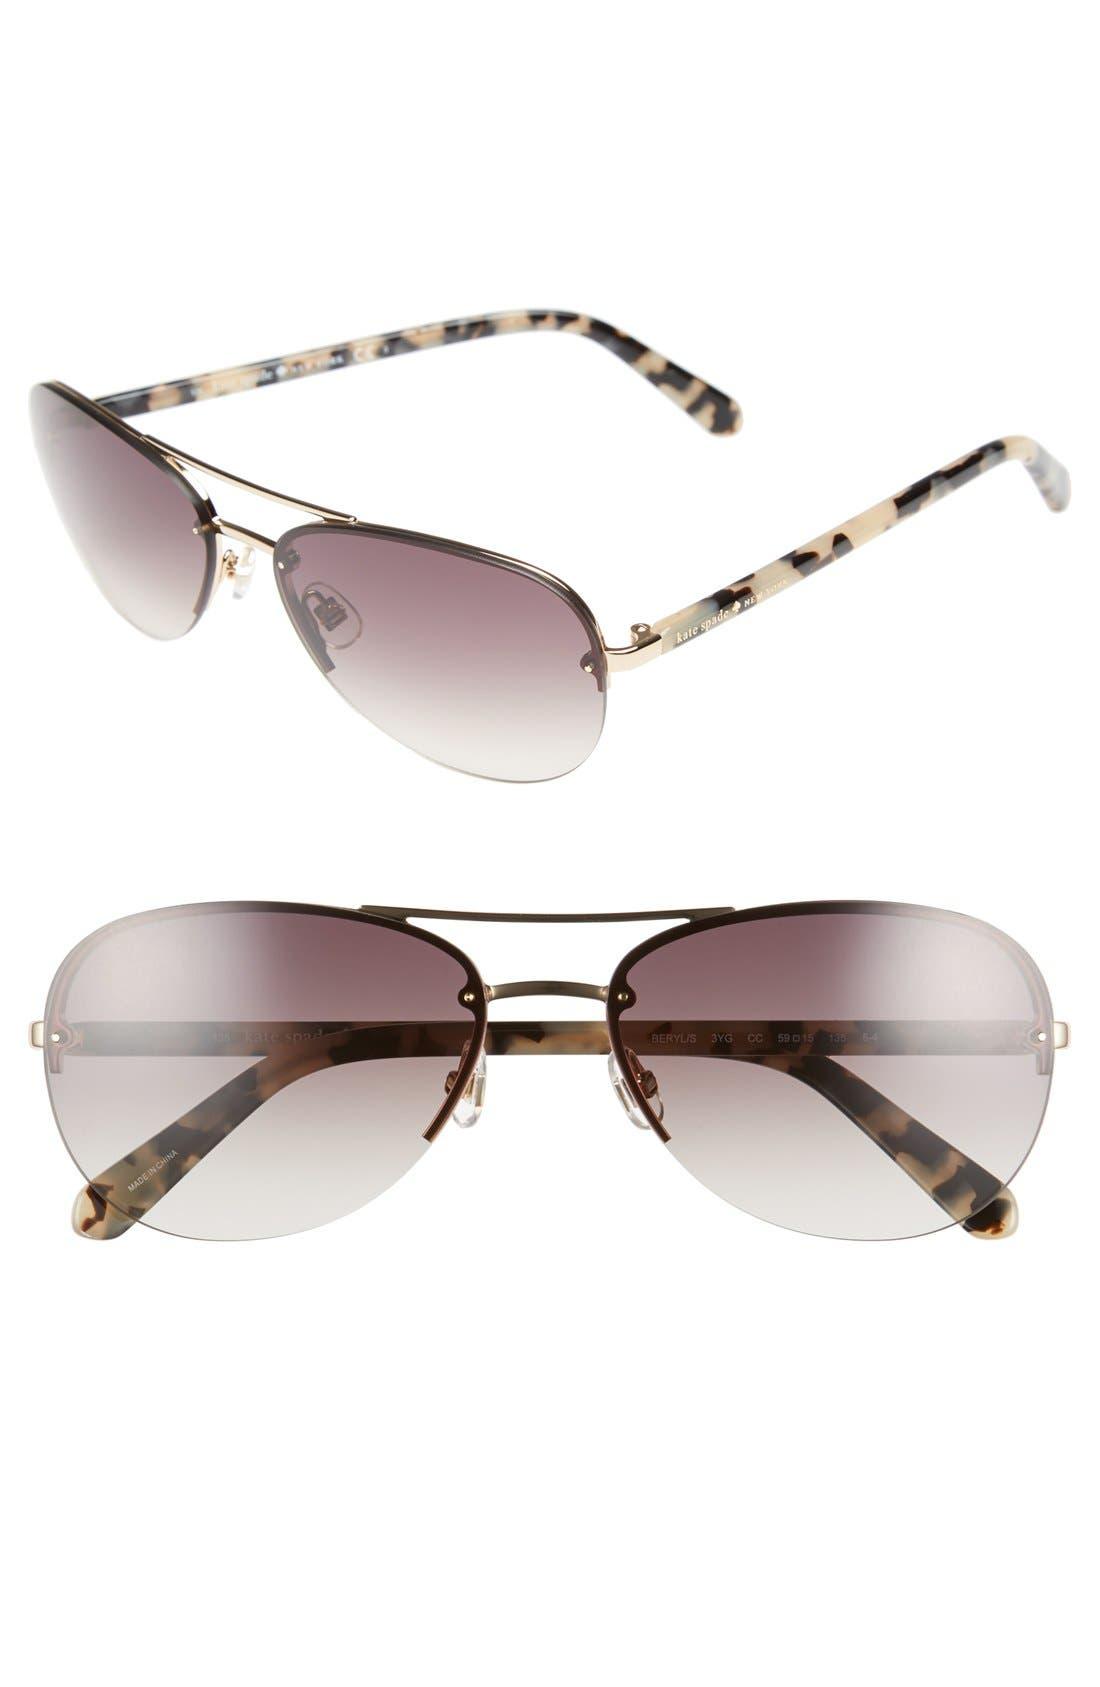 Main Image - kate spade new york 'beryls' 59mm sunglasses